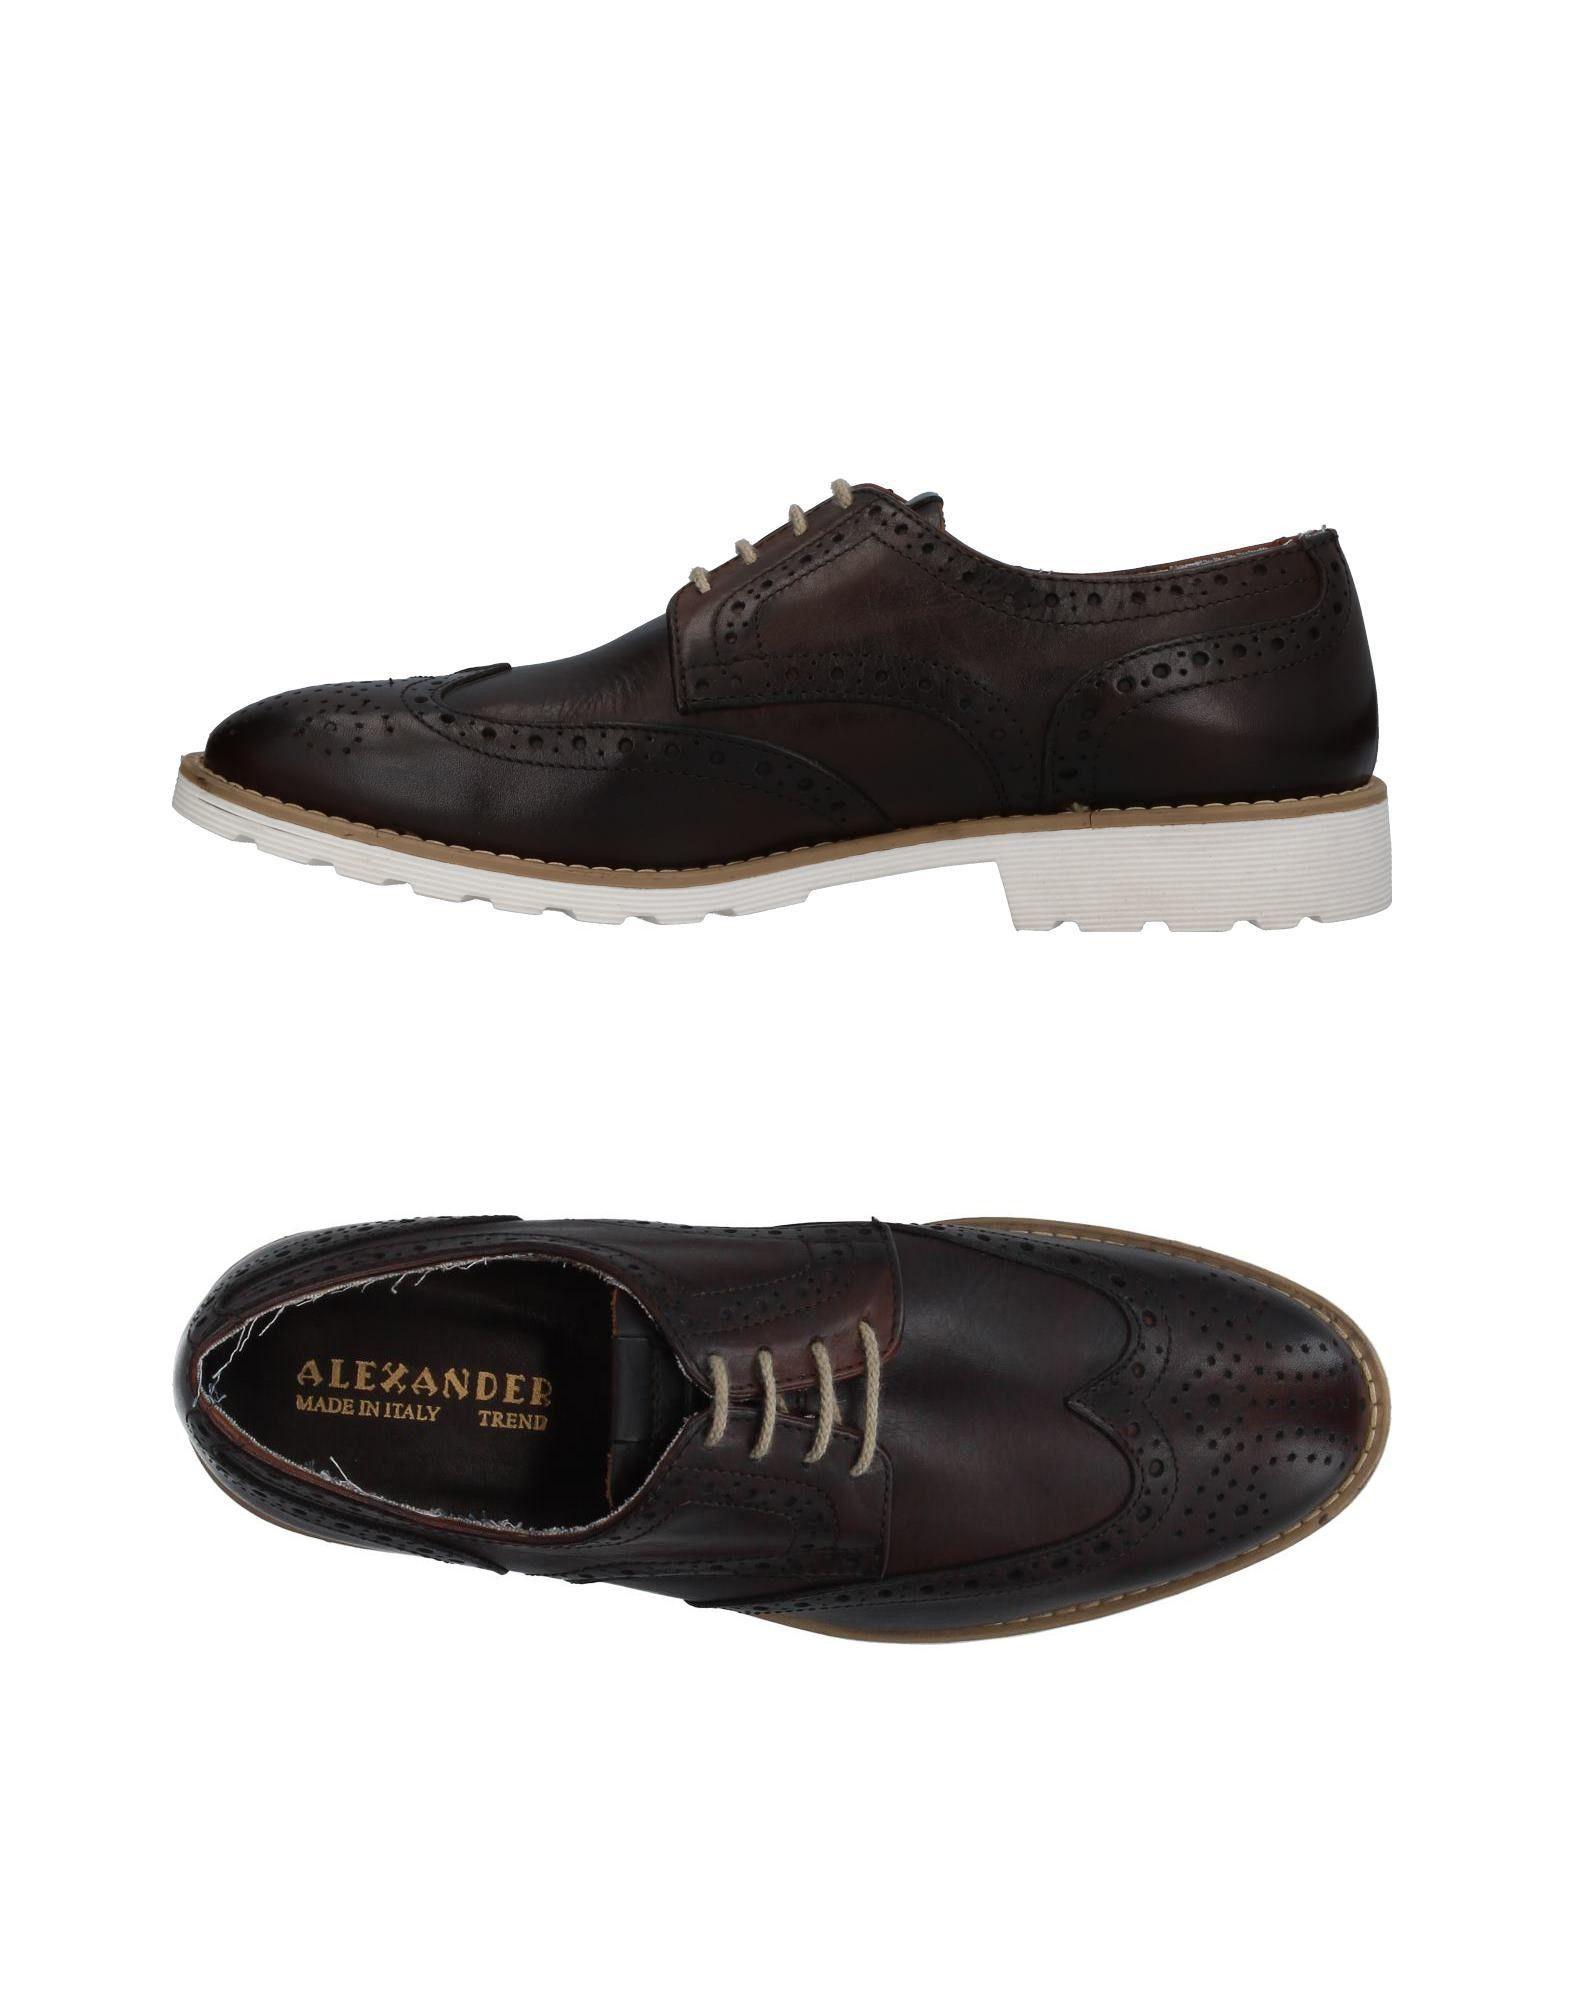 Rabatt echte Schuhe Alexander Trend Schnürschuhe Herren  11128314BU